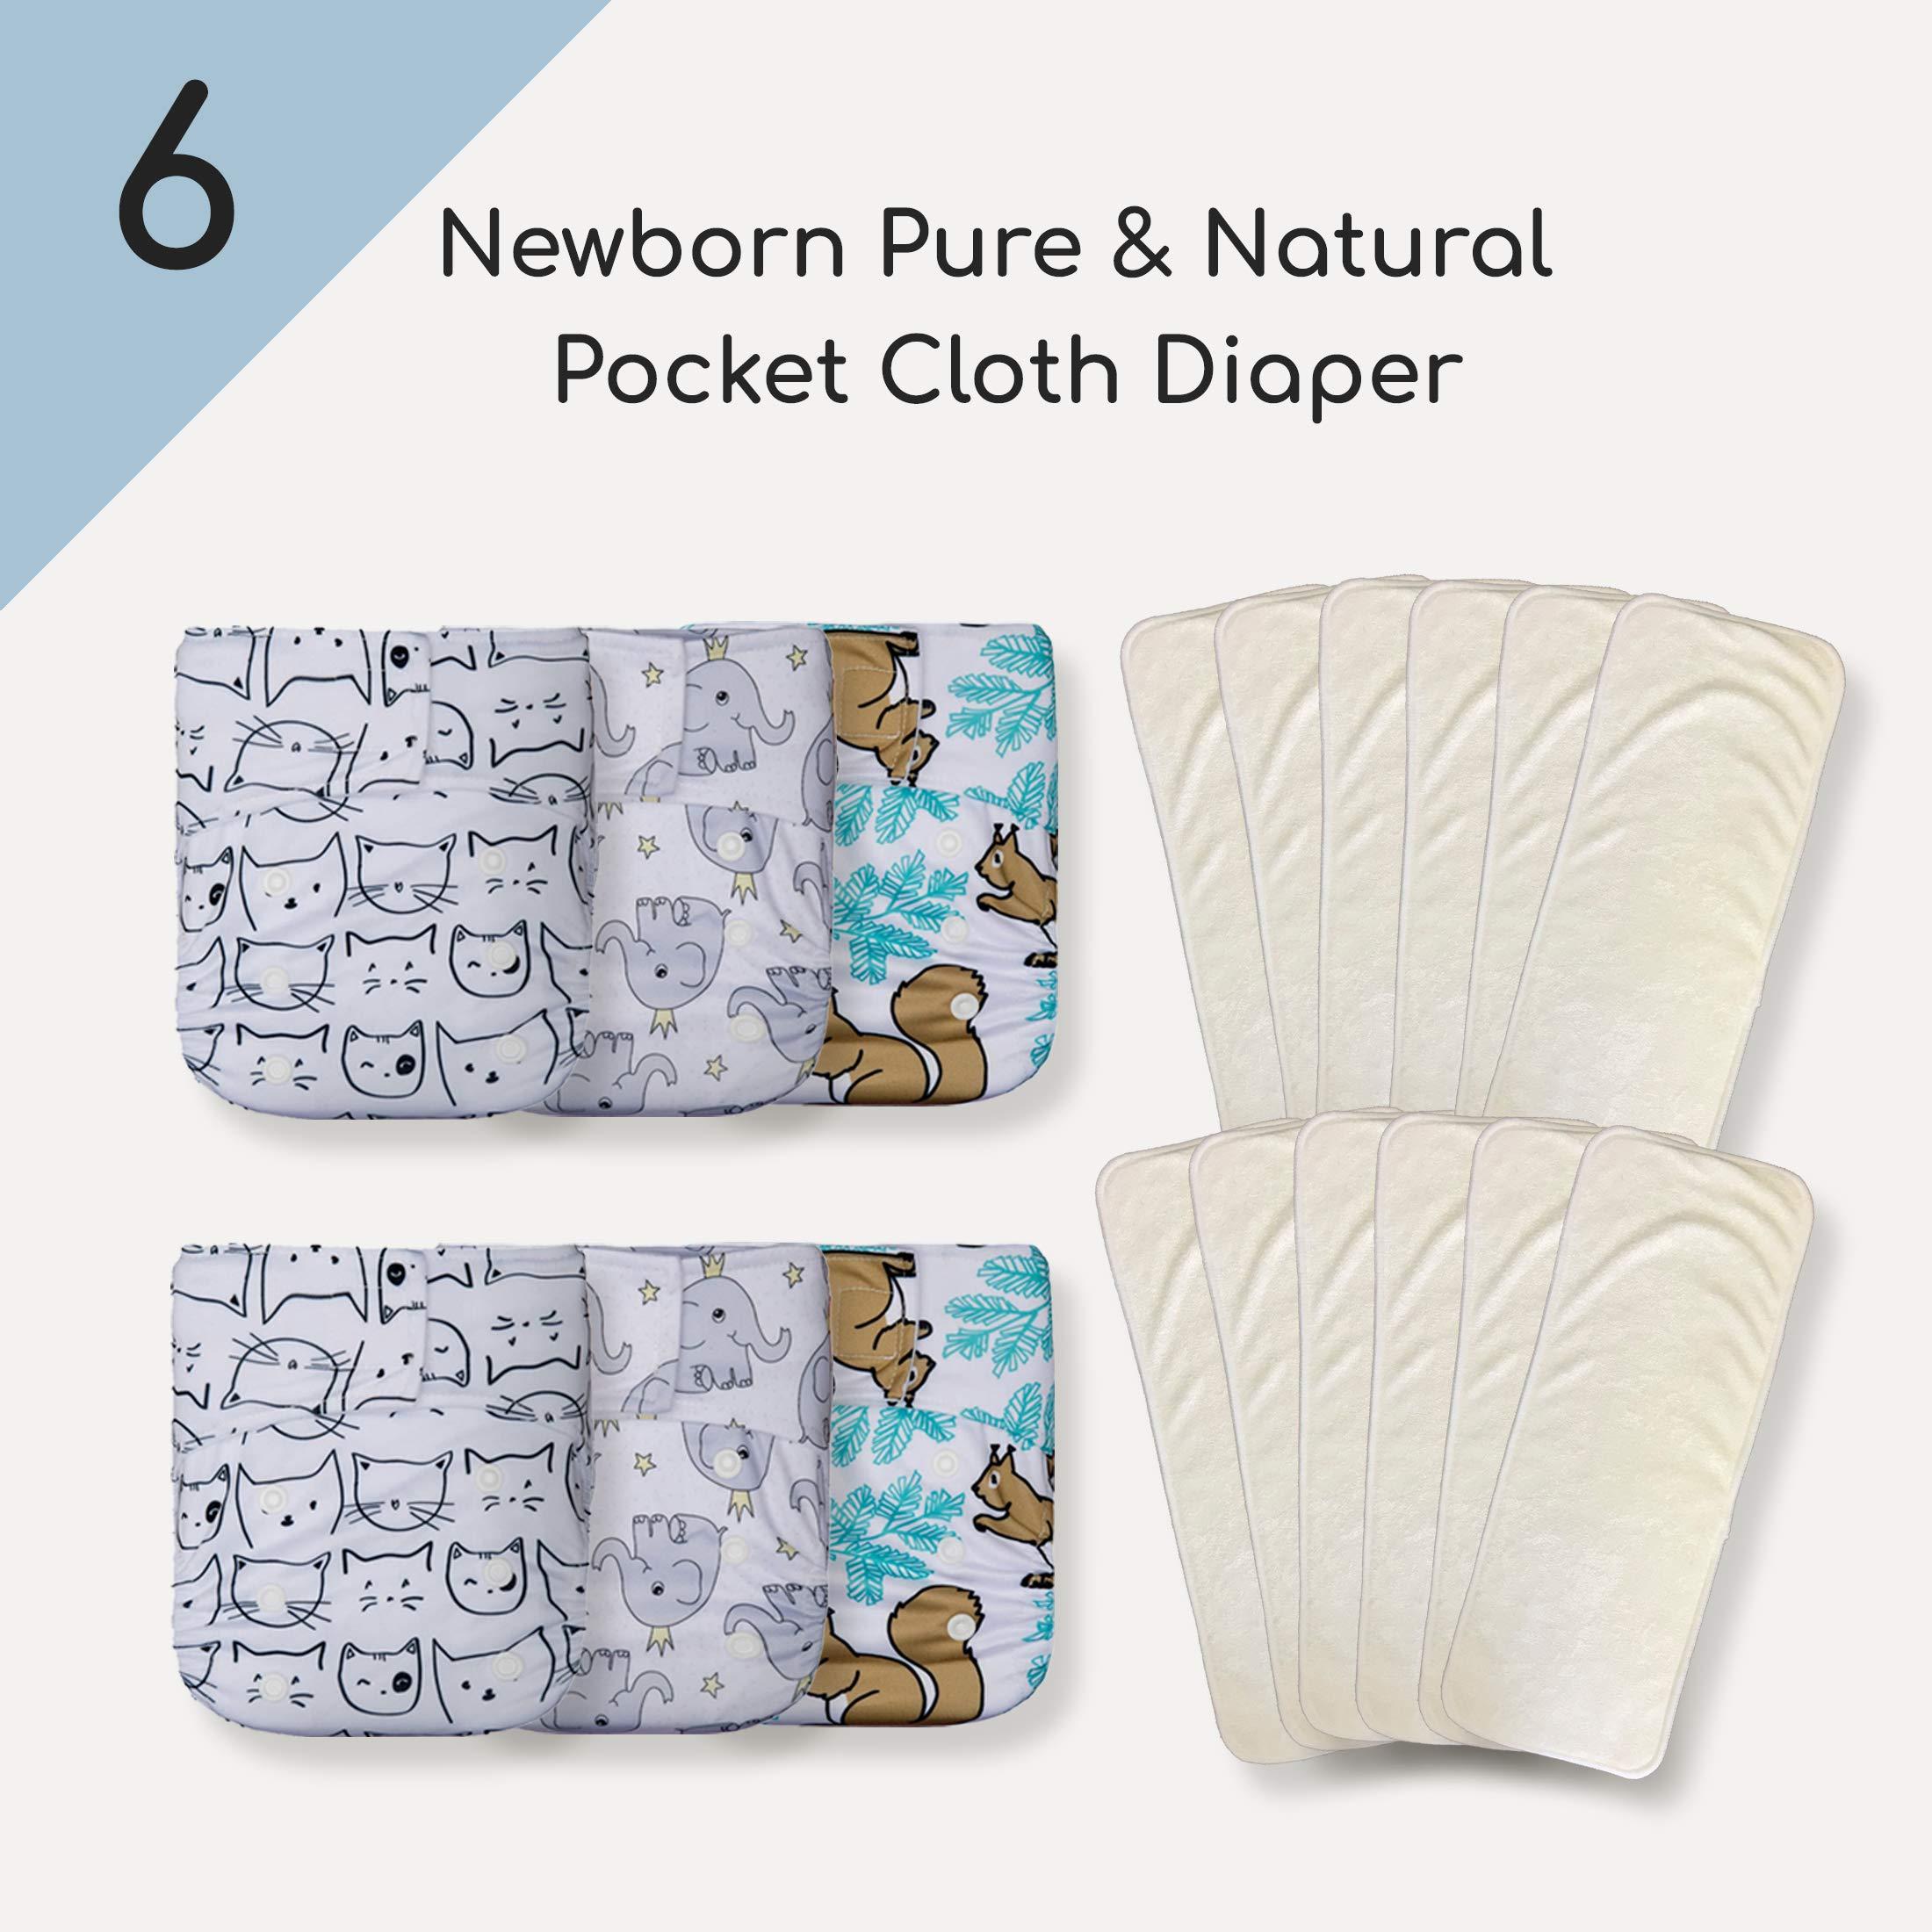 KaWaii Baby 6 Bamboo Charcoal Pocket Cloth Diaper with 12 Bamboo Charcoal Inserts.